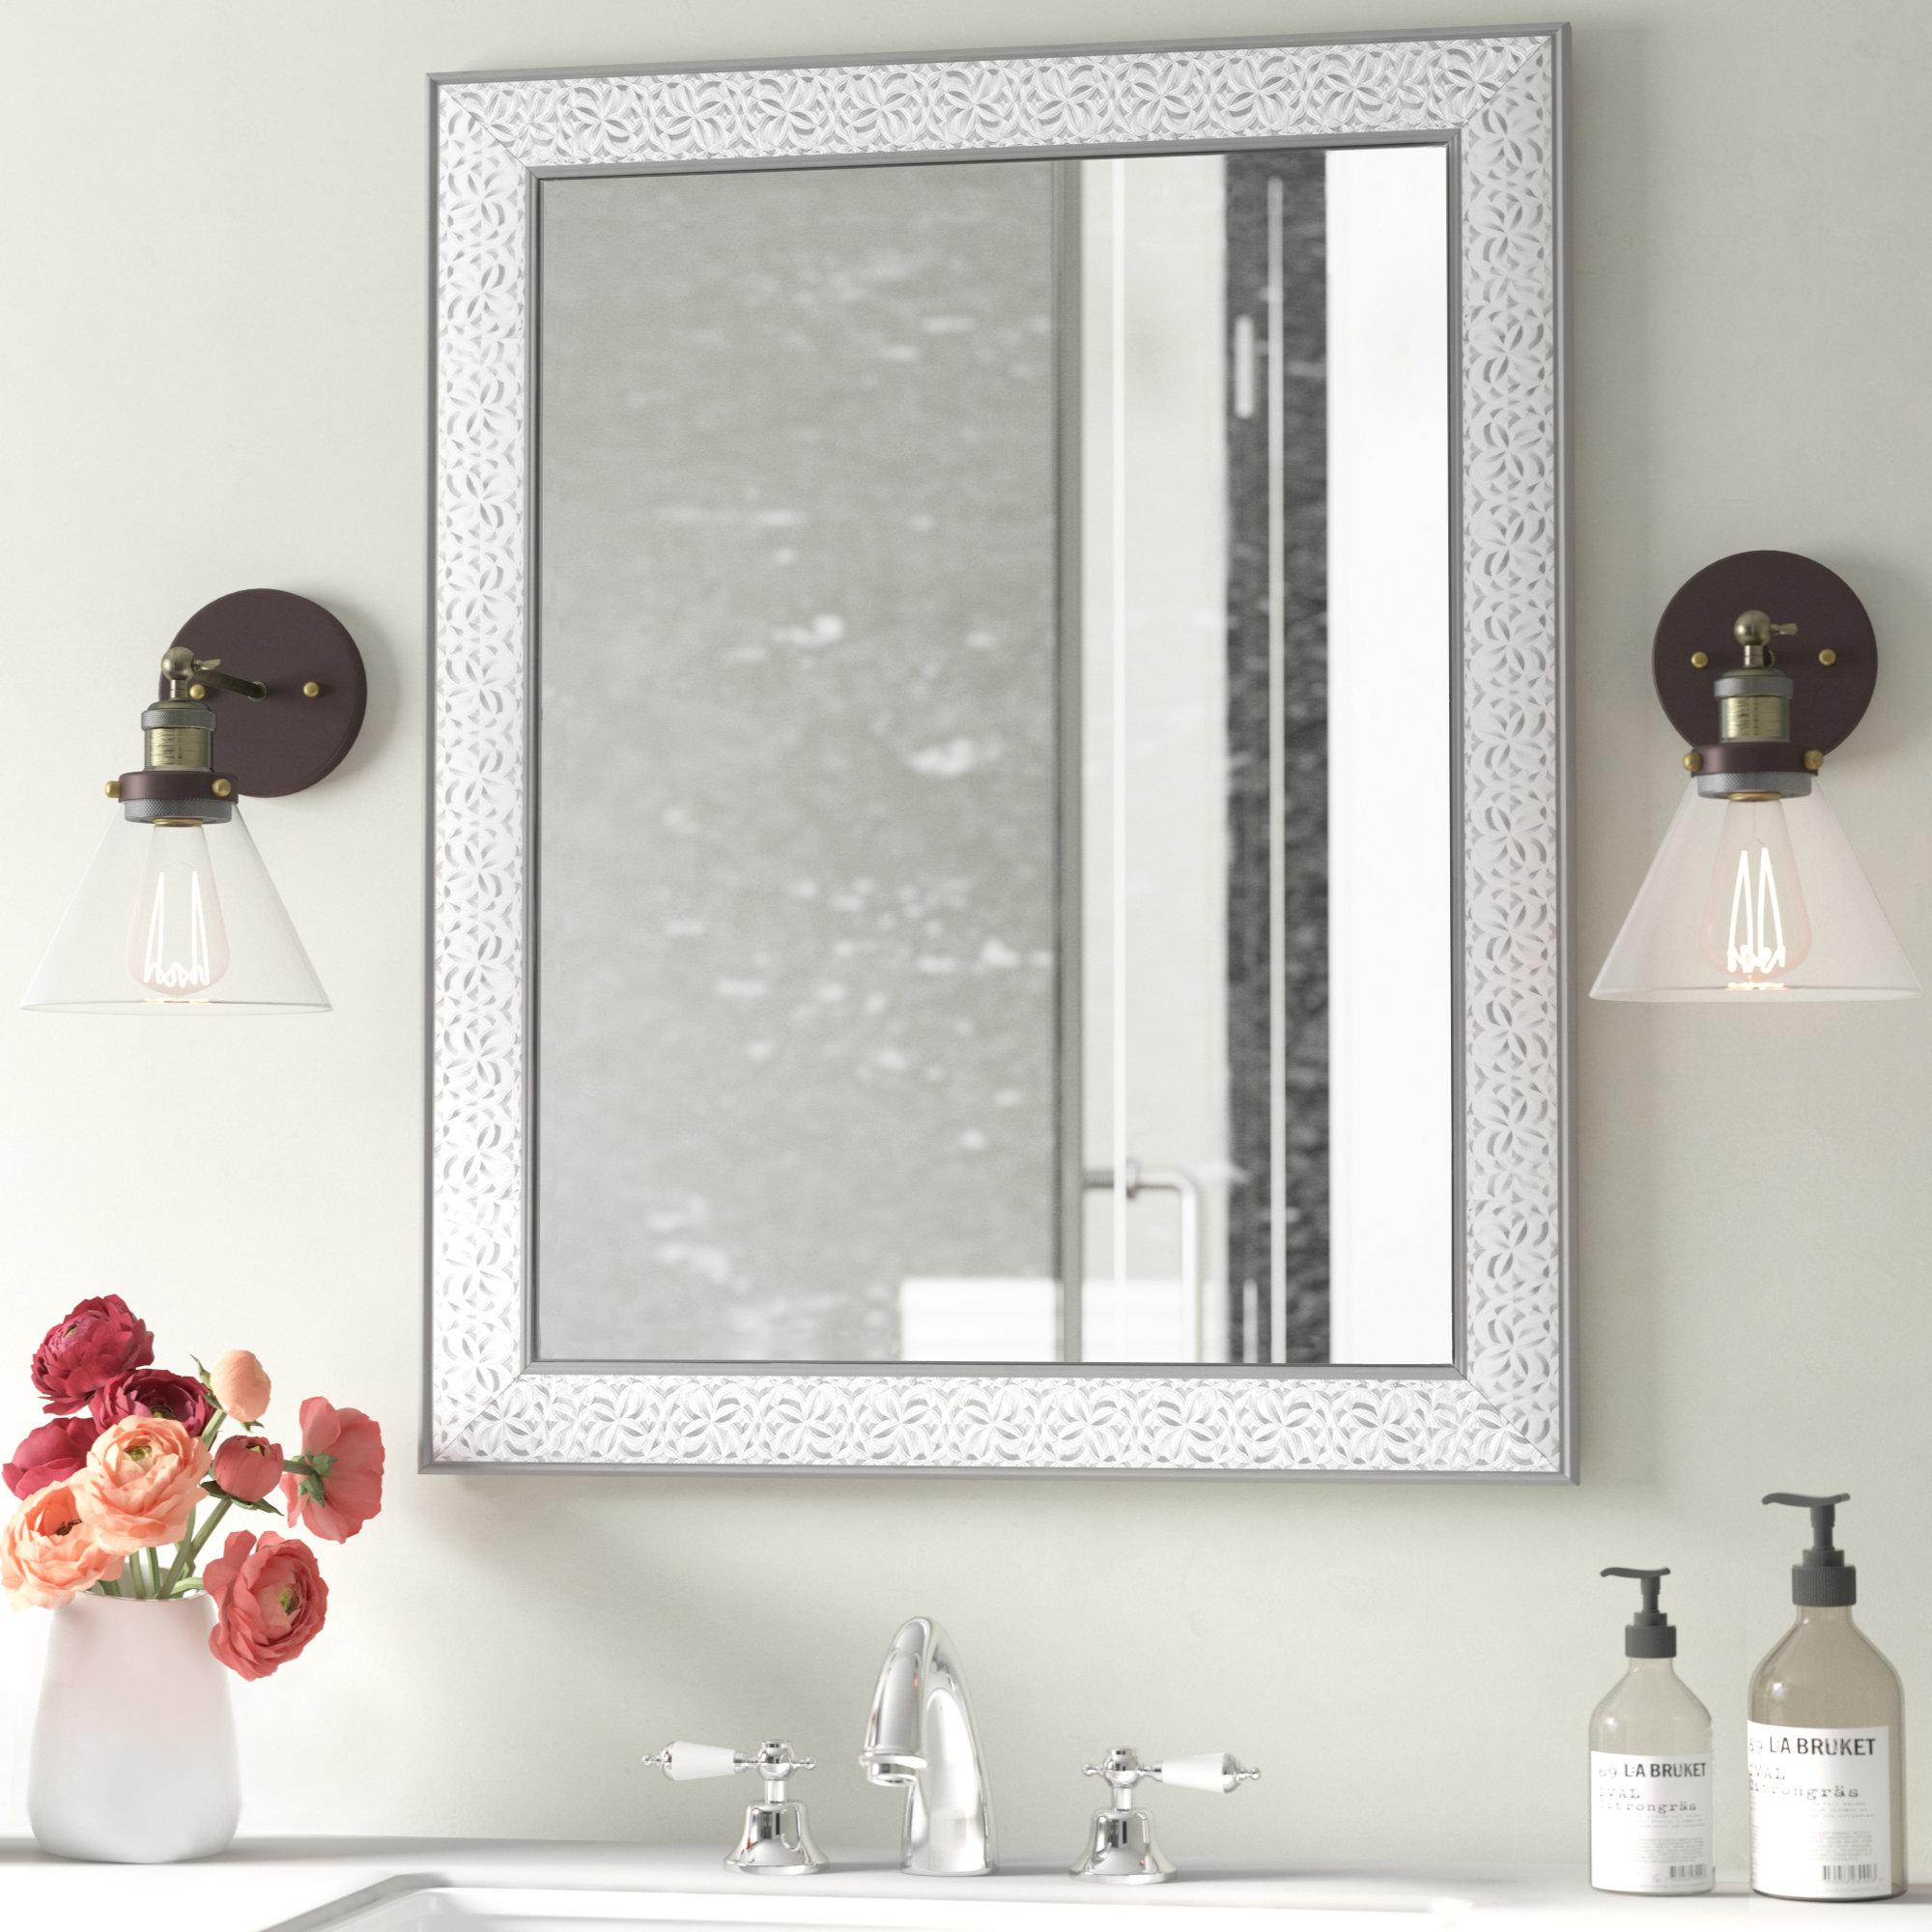 Commercial Bathroom Mirror | Wayfair Inside Mexborough Bathroom/vanity Mirrors (Image 4 of 20)